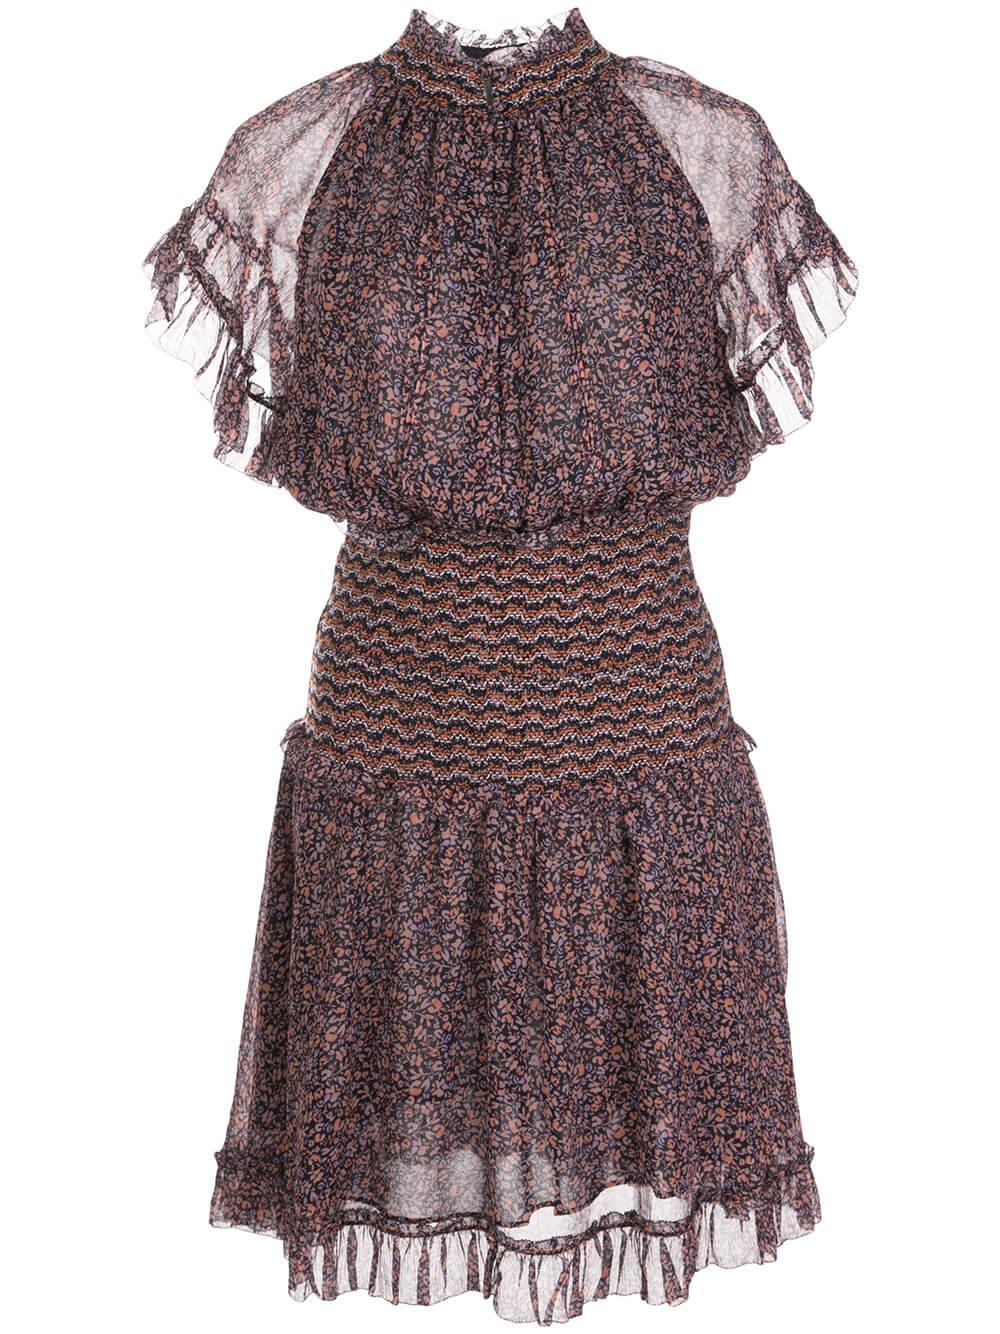 Serena Floral Crinkle Chiffon Dress Item # 220-1033-N